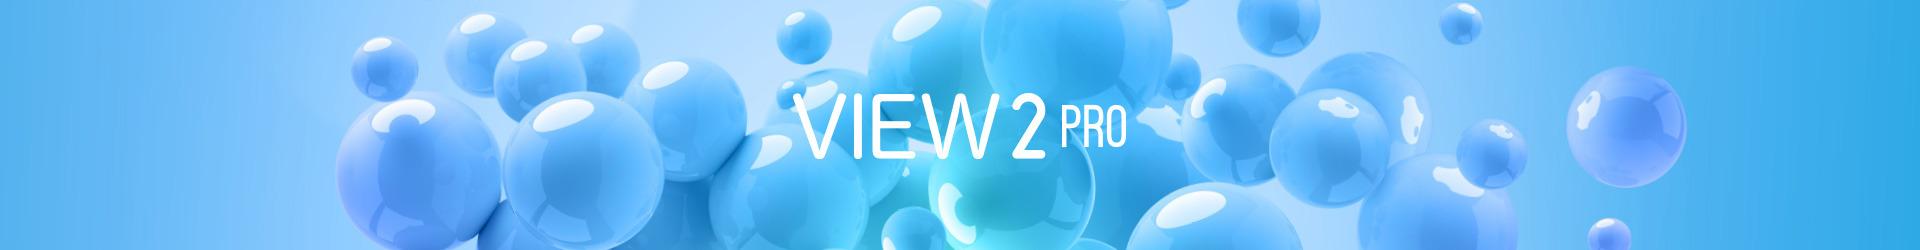 Smartphone View2 Pro